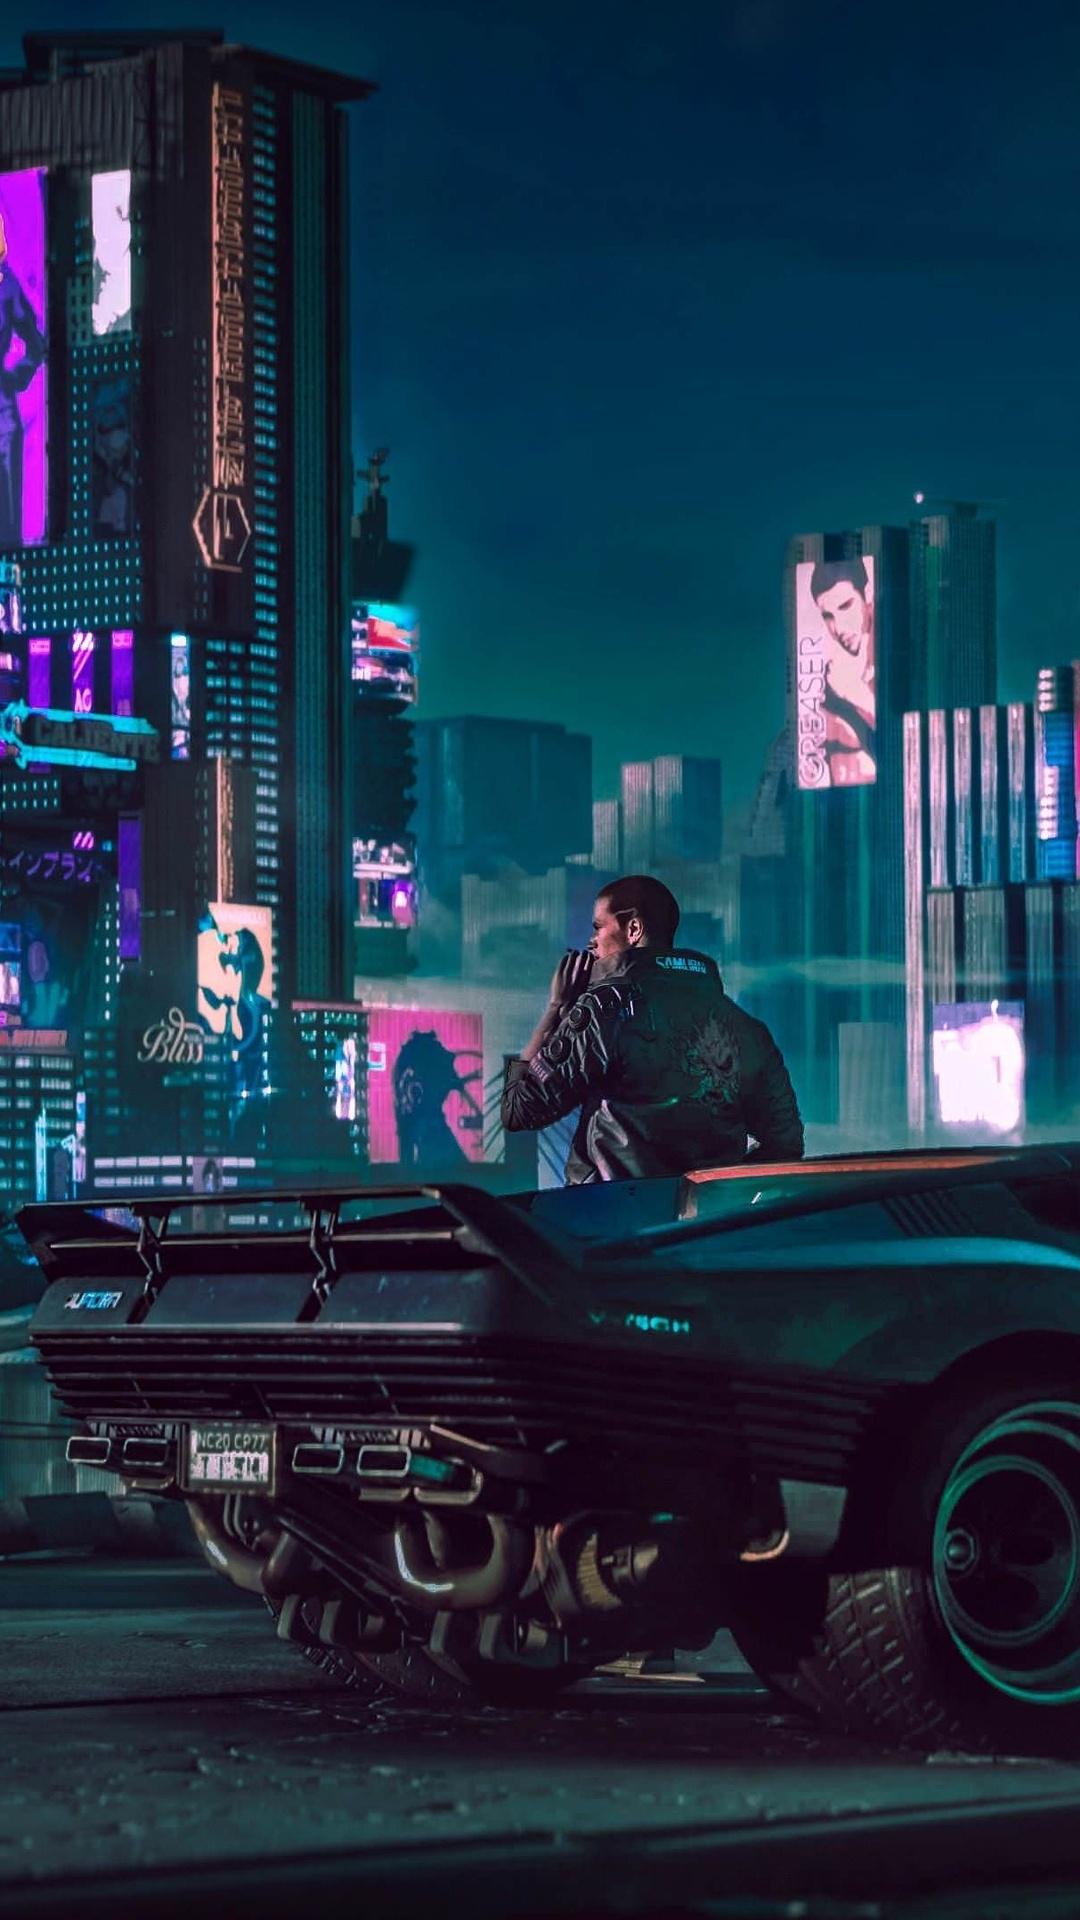 1080x1920 2018 Cyberpunk 2077 4k Iphone 7,6s,6 Plus, Pixel ...